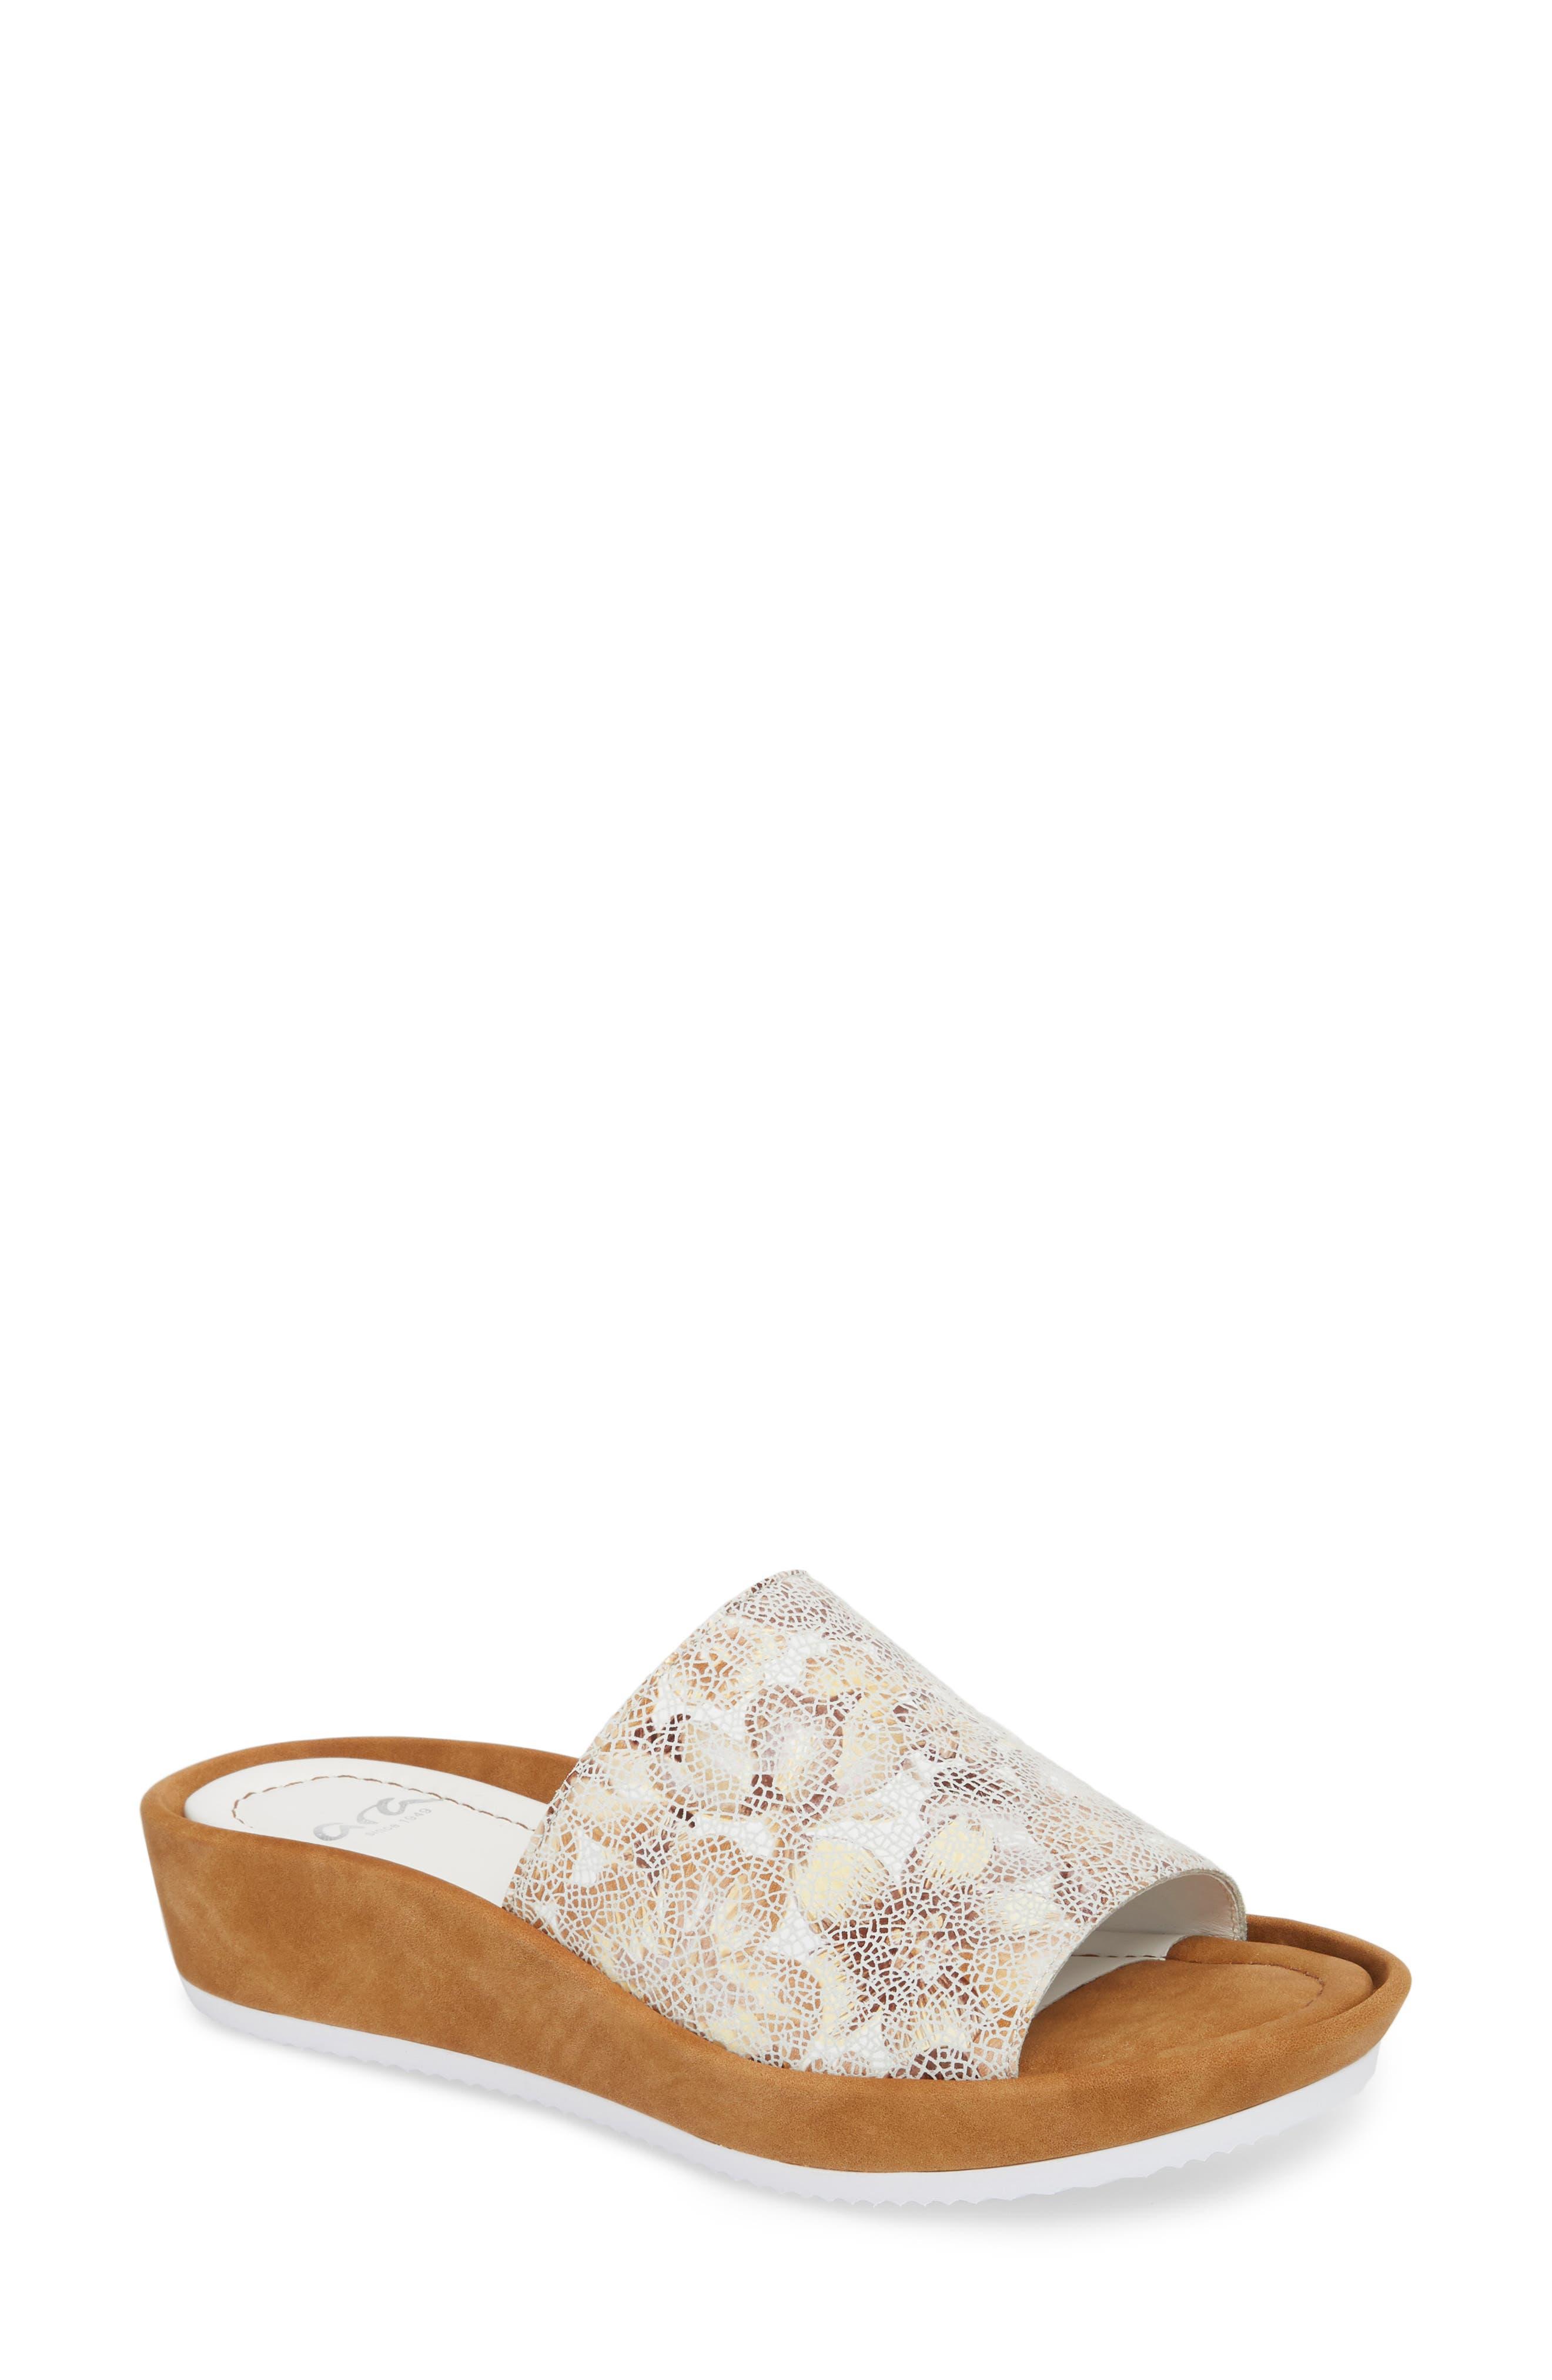 Tania Platform Wedge Slide Sandal,                         Main,                         color, Taupe Leather